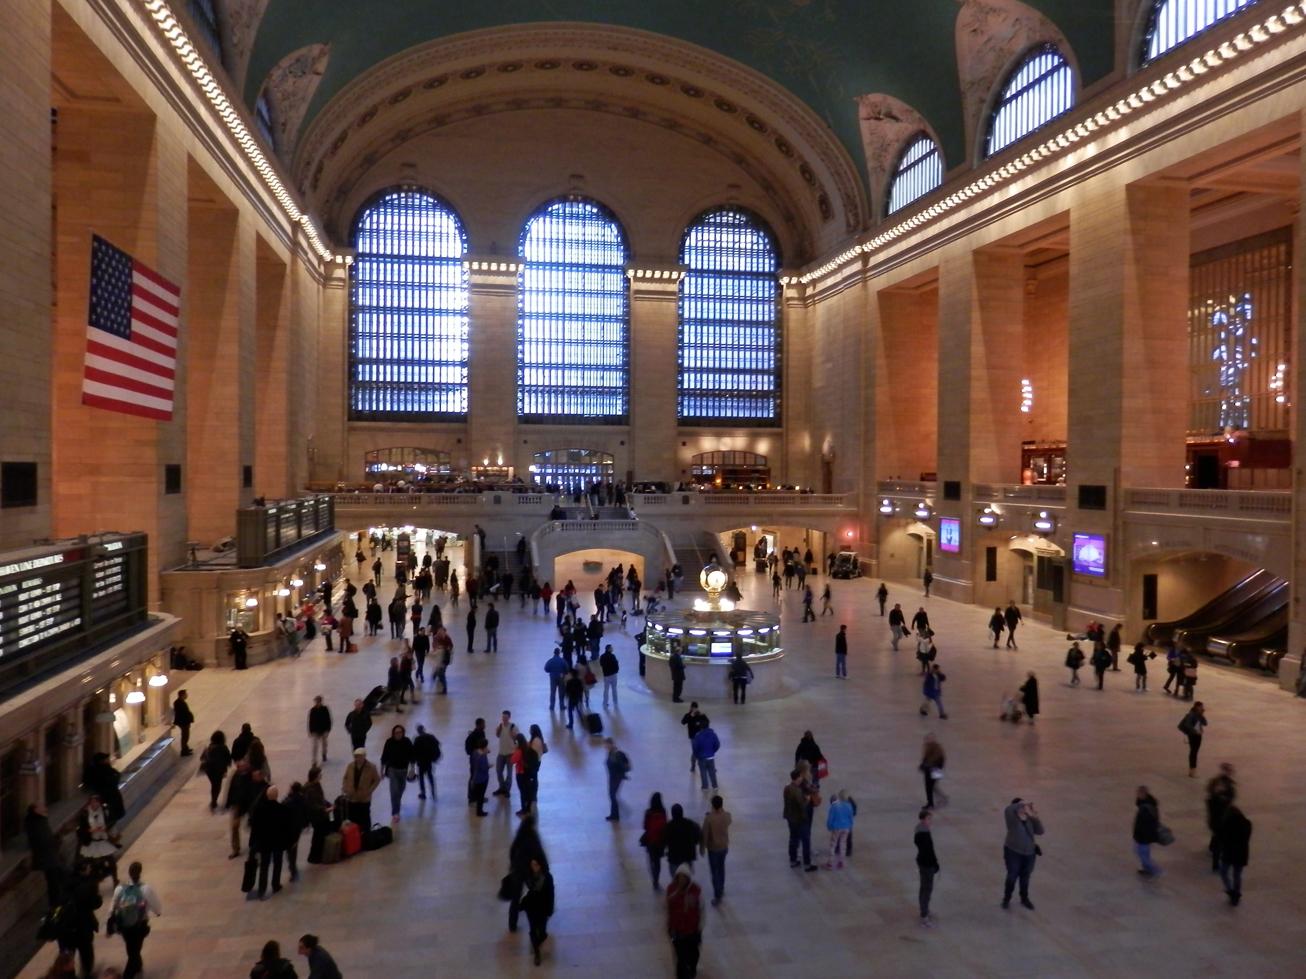 Le hall de la gare (calme, car c'est dimanche).